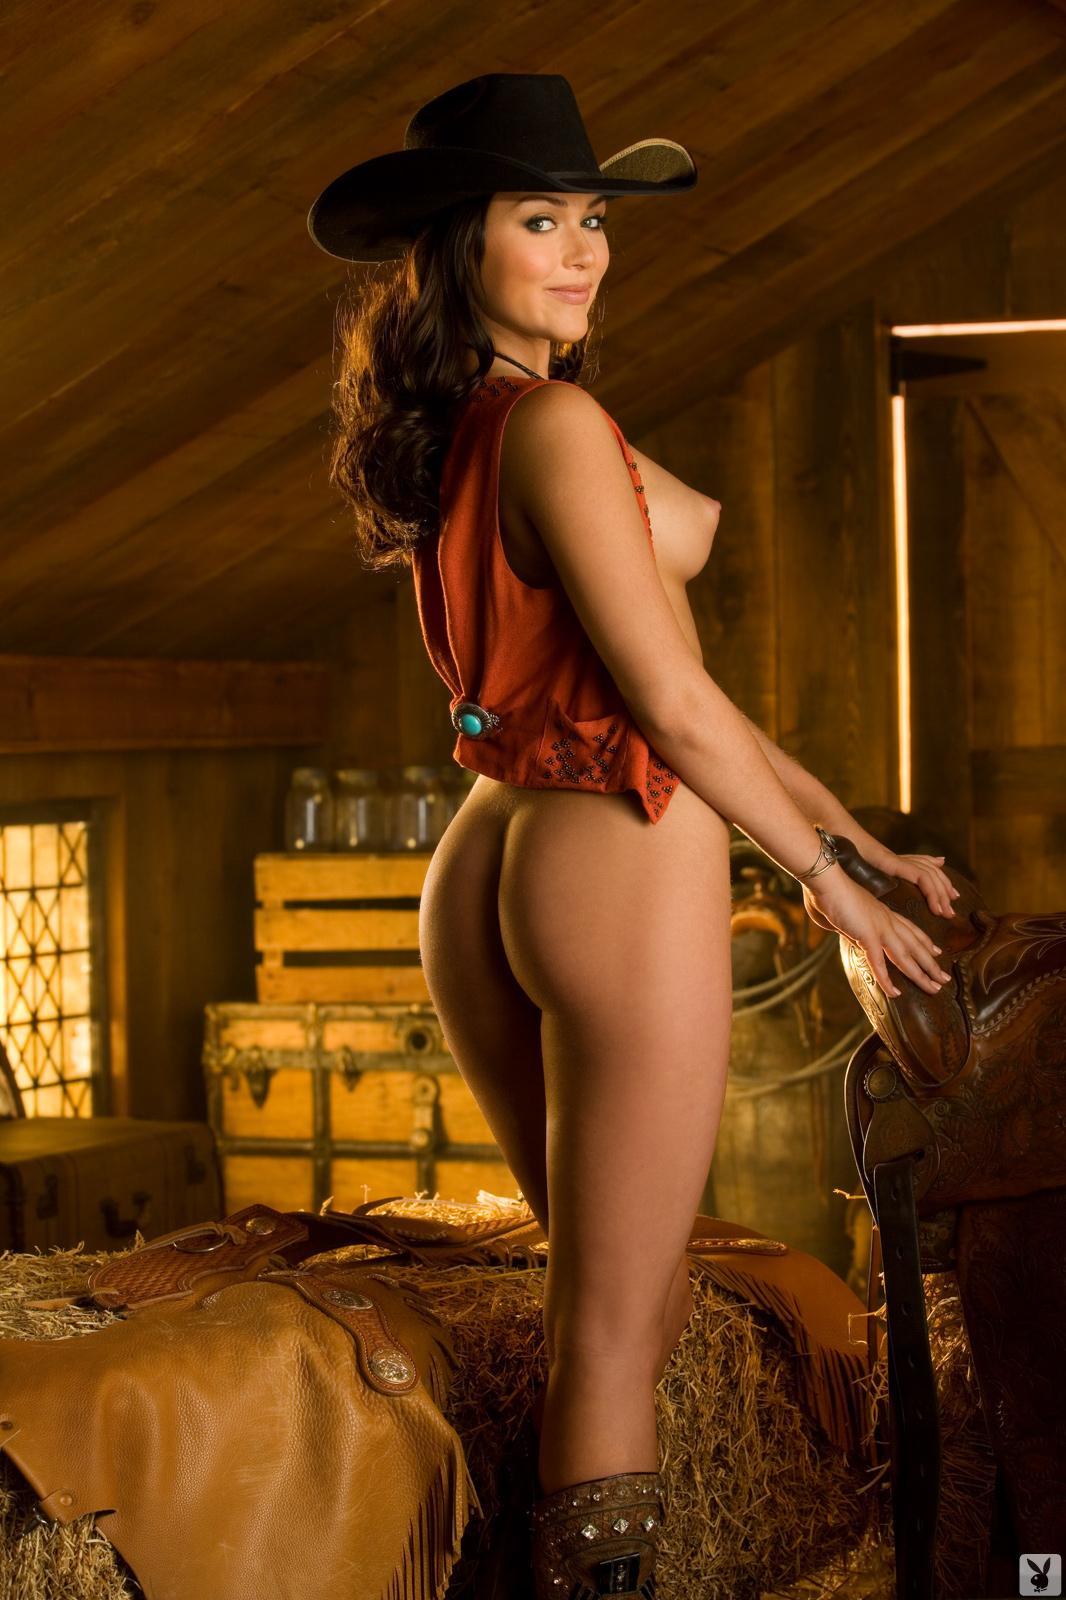 rainy-day-jordan-barn-naked-cowgirl-ranch-playboy-05